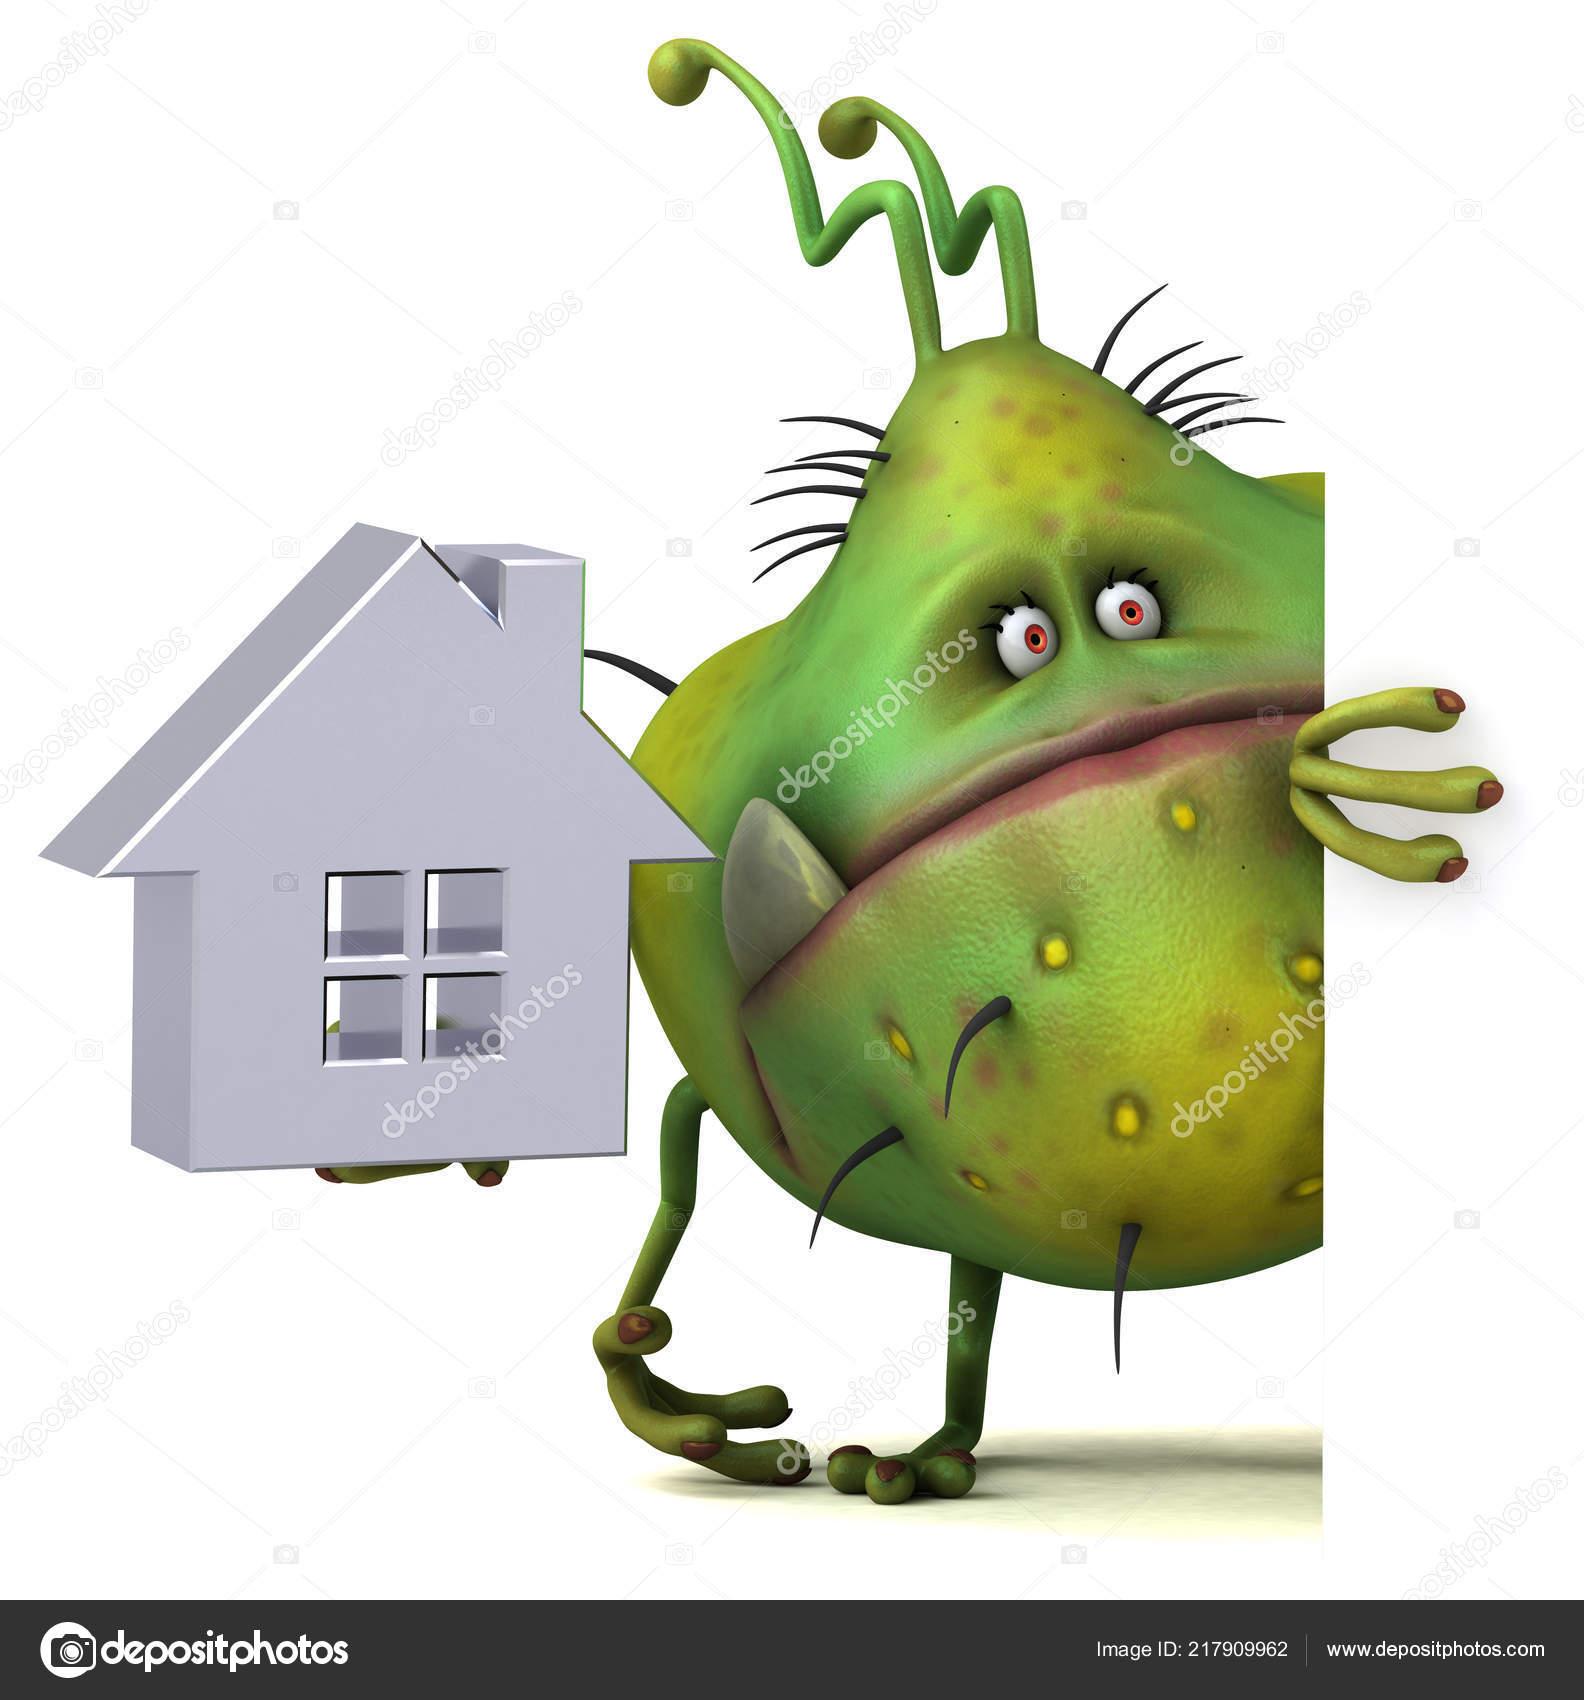 Fun Cartoon Character House Illustration — Stock Photo